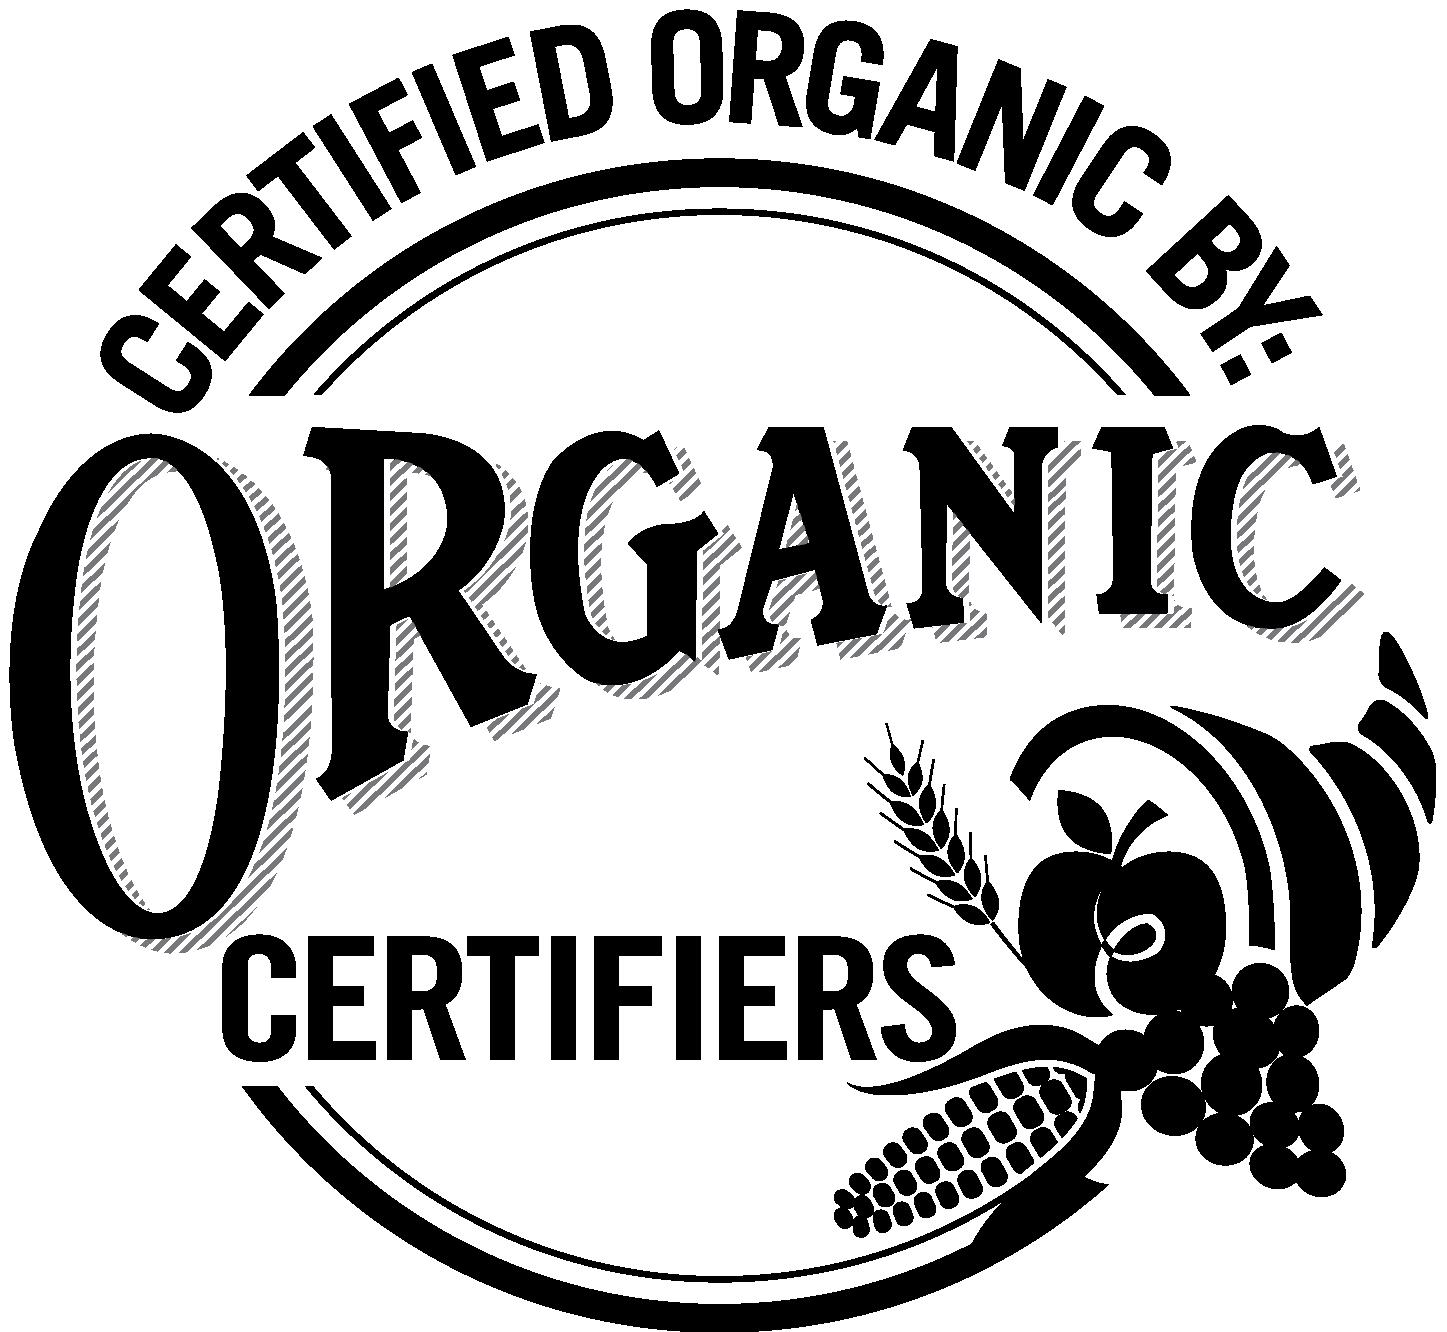 Certified organic farm hawaii